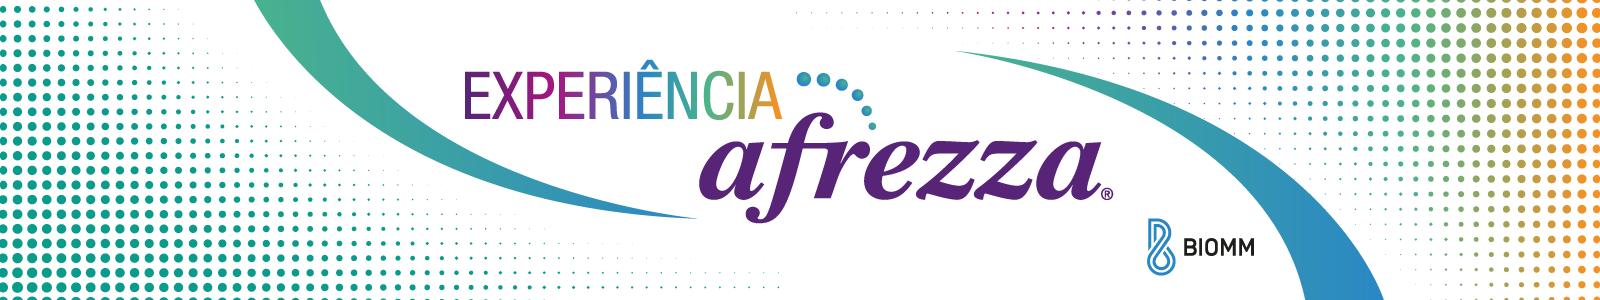 Academia Afrezza-banner-experiência